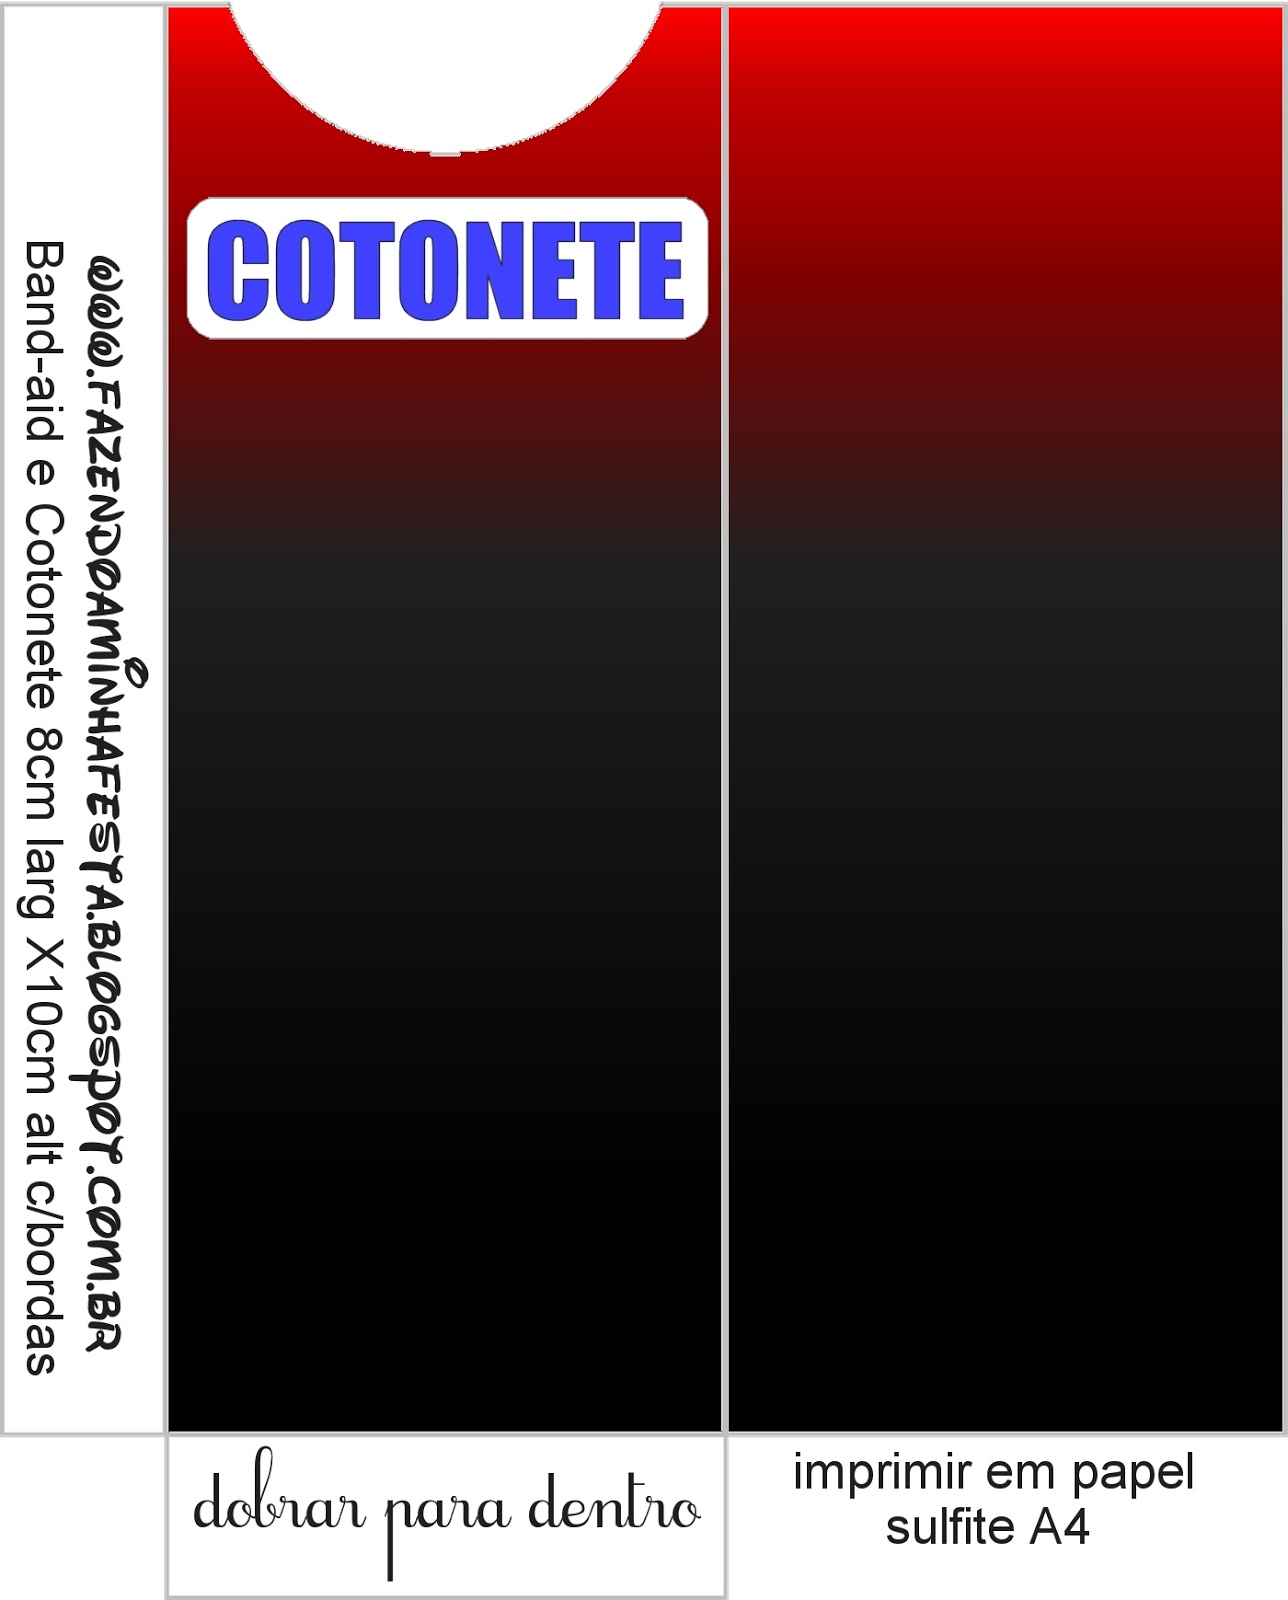 Kit Toilet – Banheiro Vermelho e Preto #C90101 1288 1600